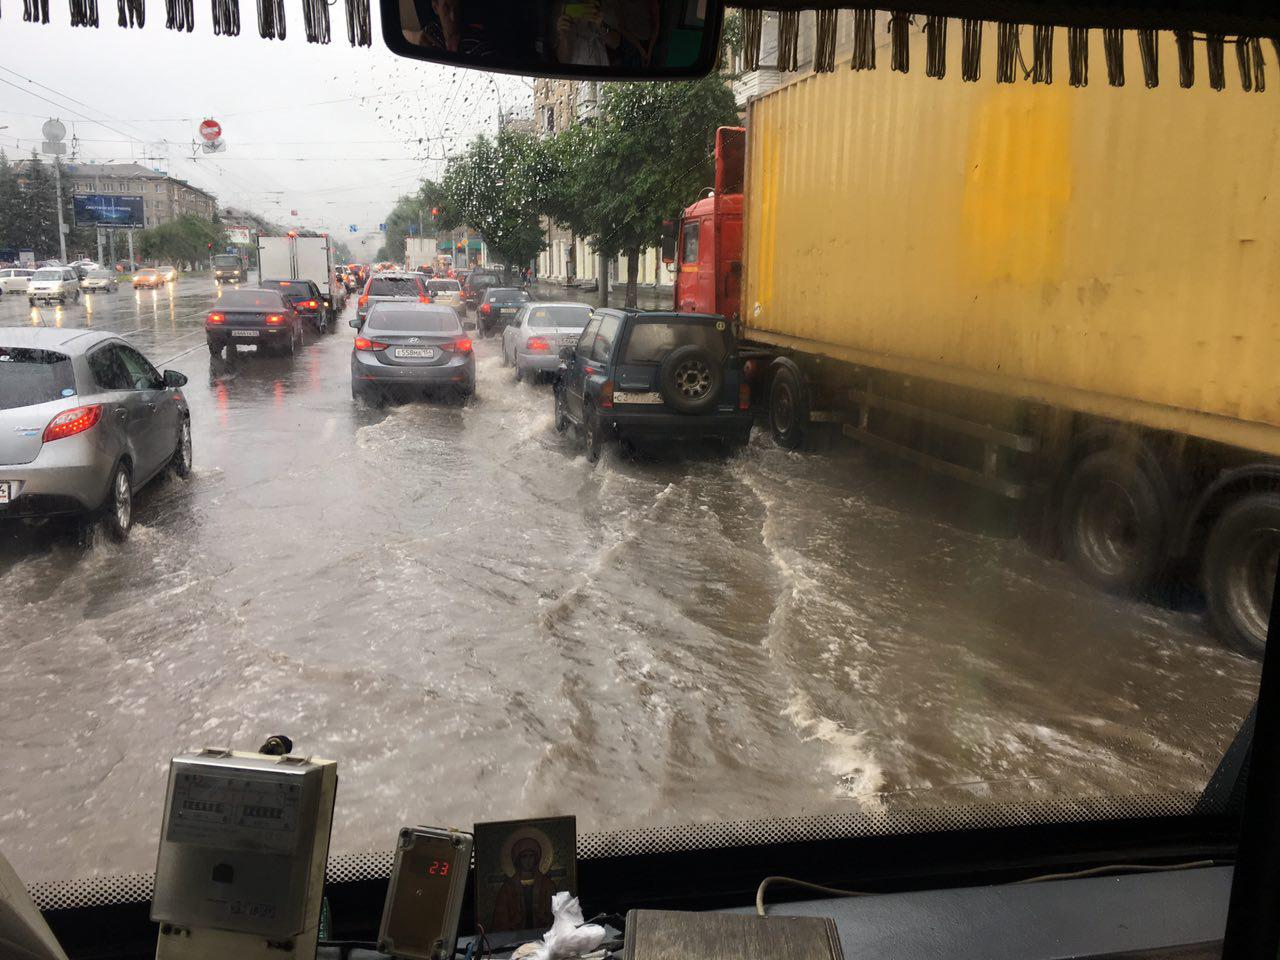 Последствия дождя. Фото читателя